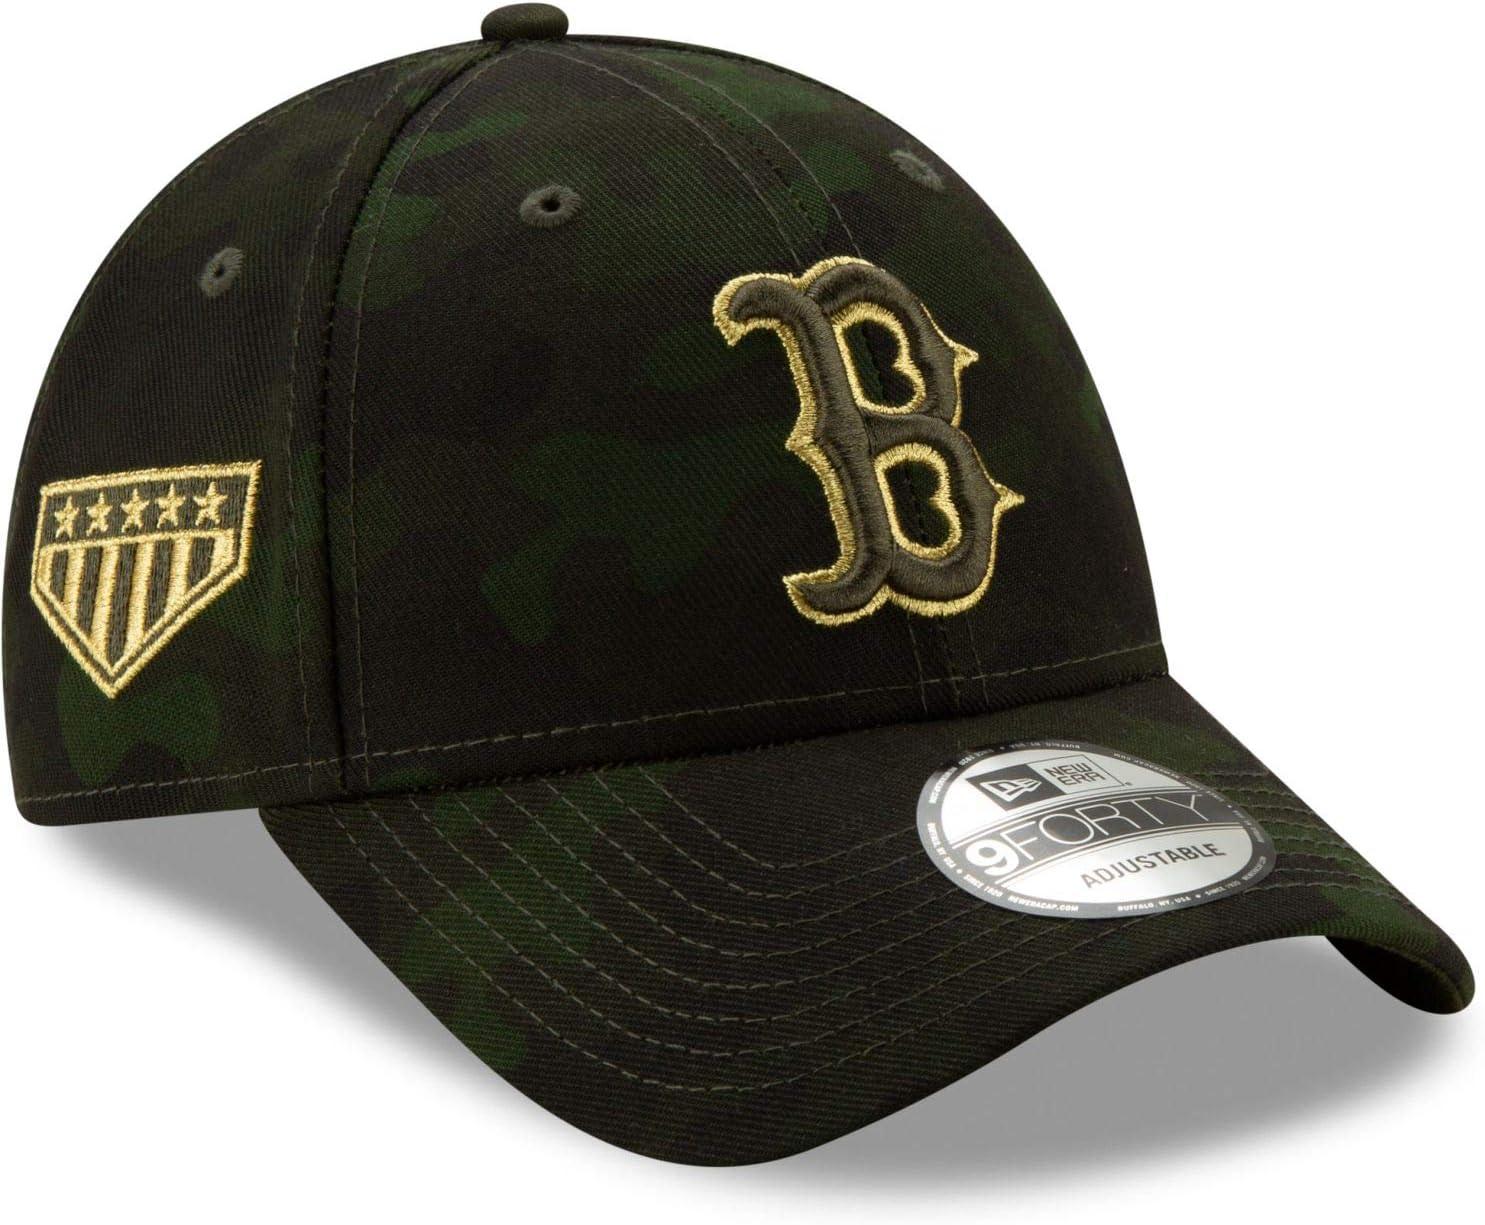 Armed Forces Day Boston Red Sox New Era 9Twenty Cap